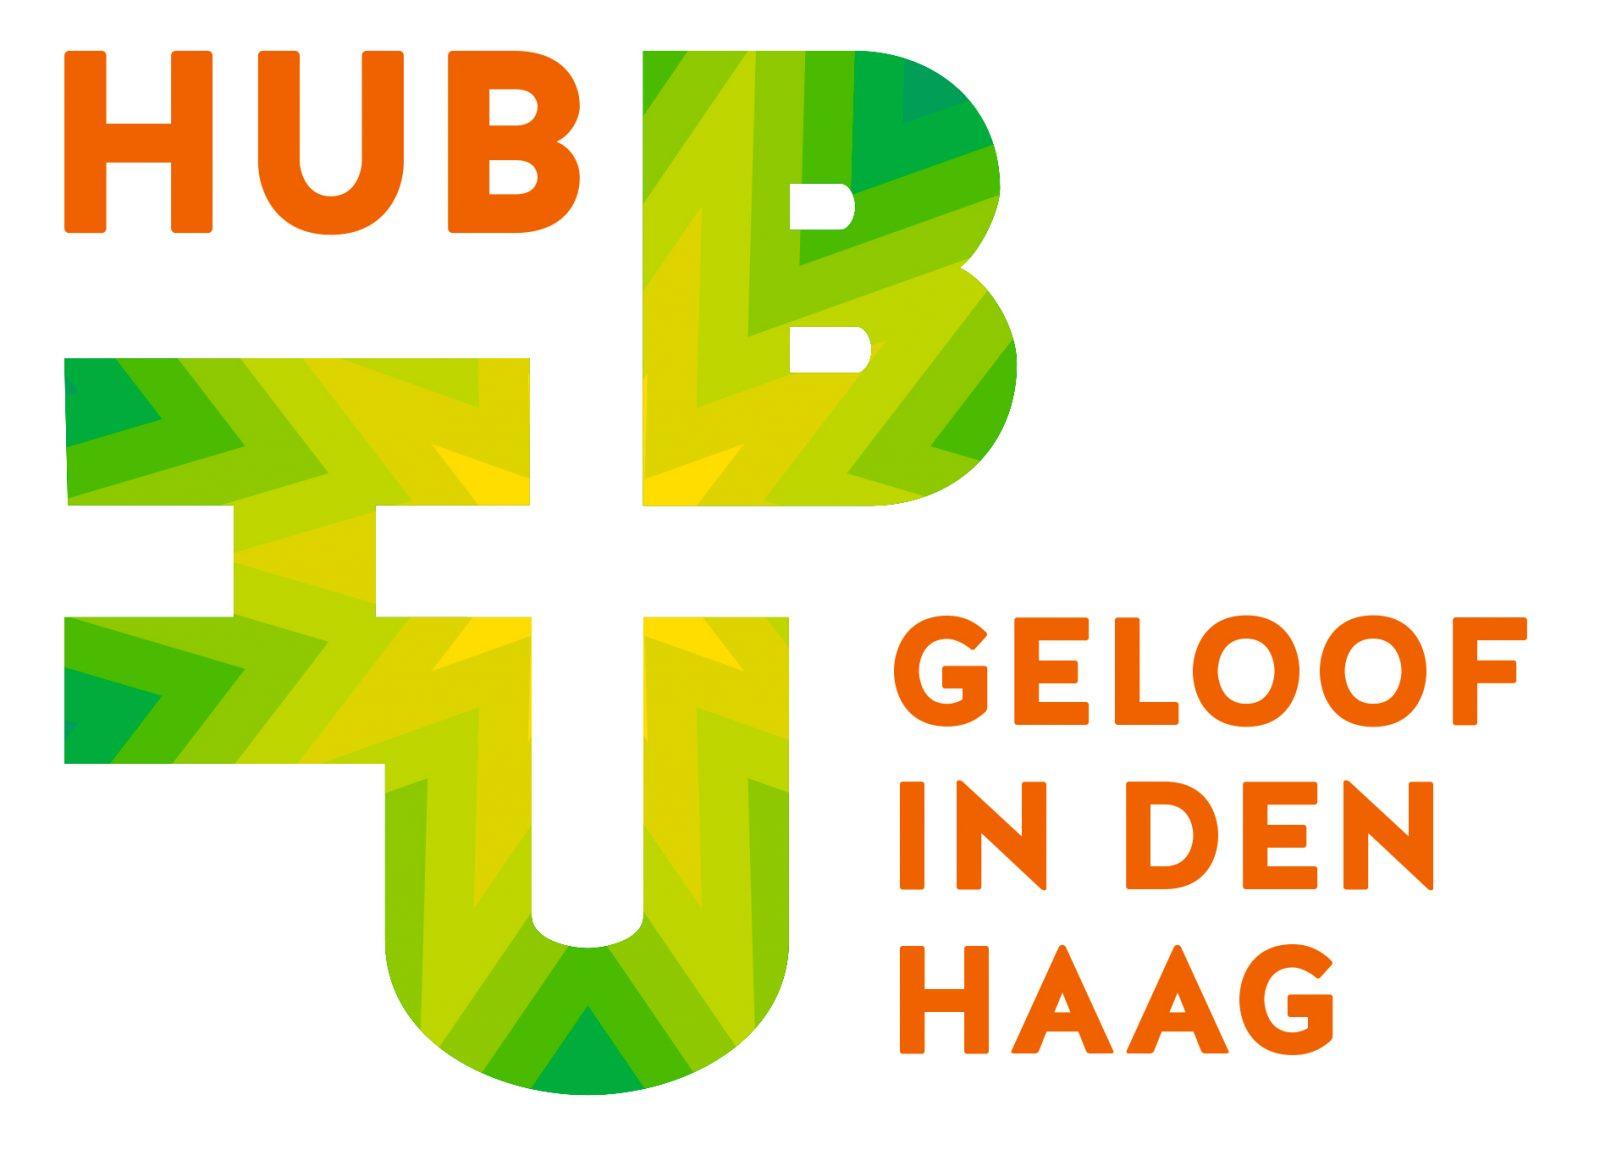 HUB: Den Haag